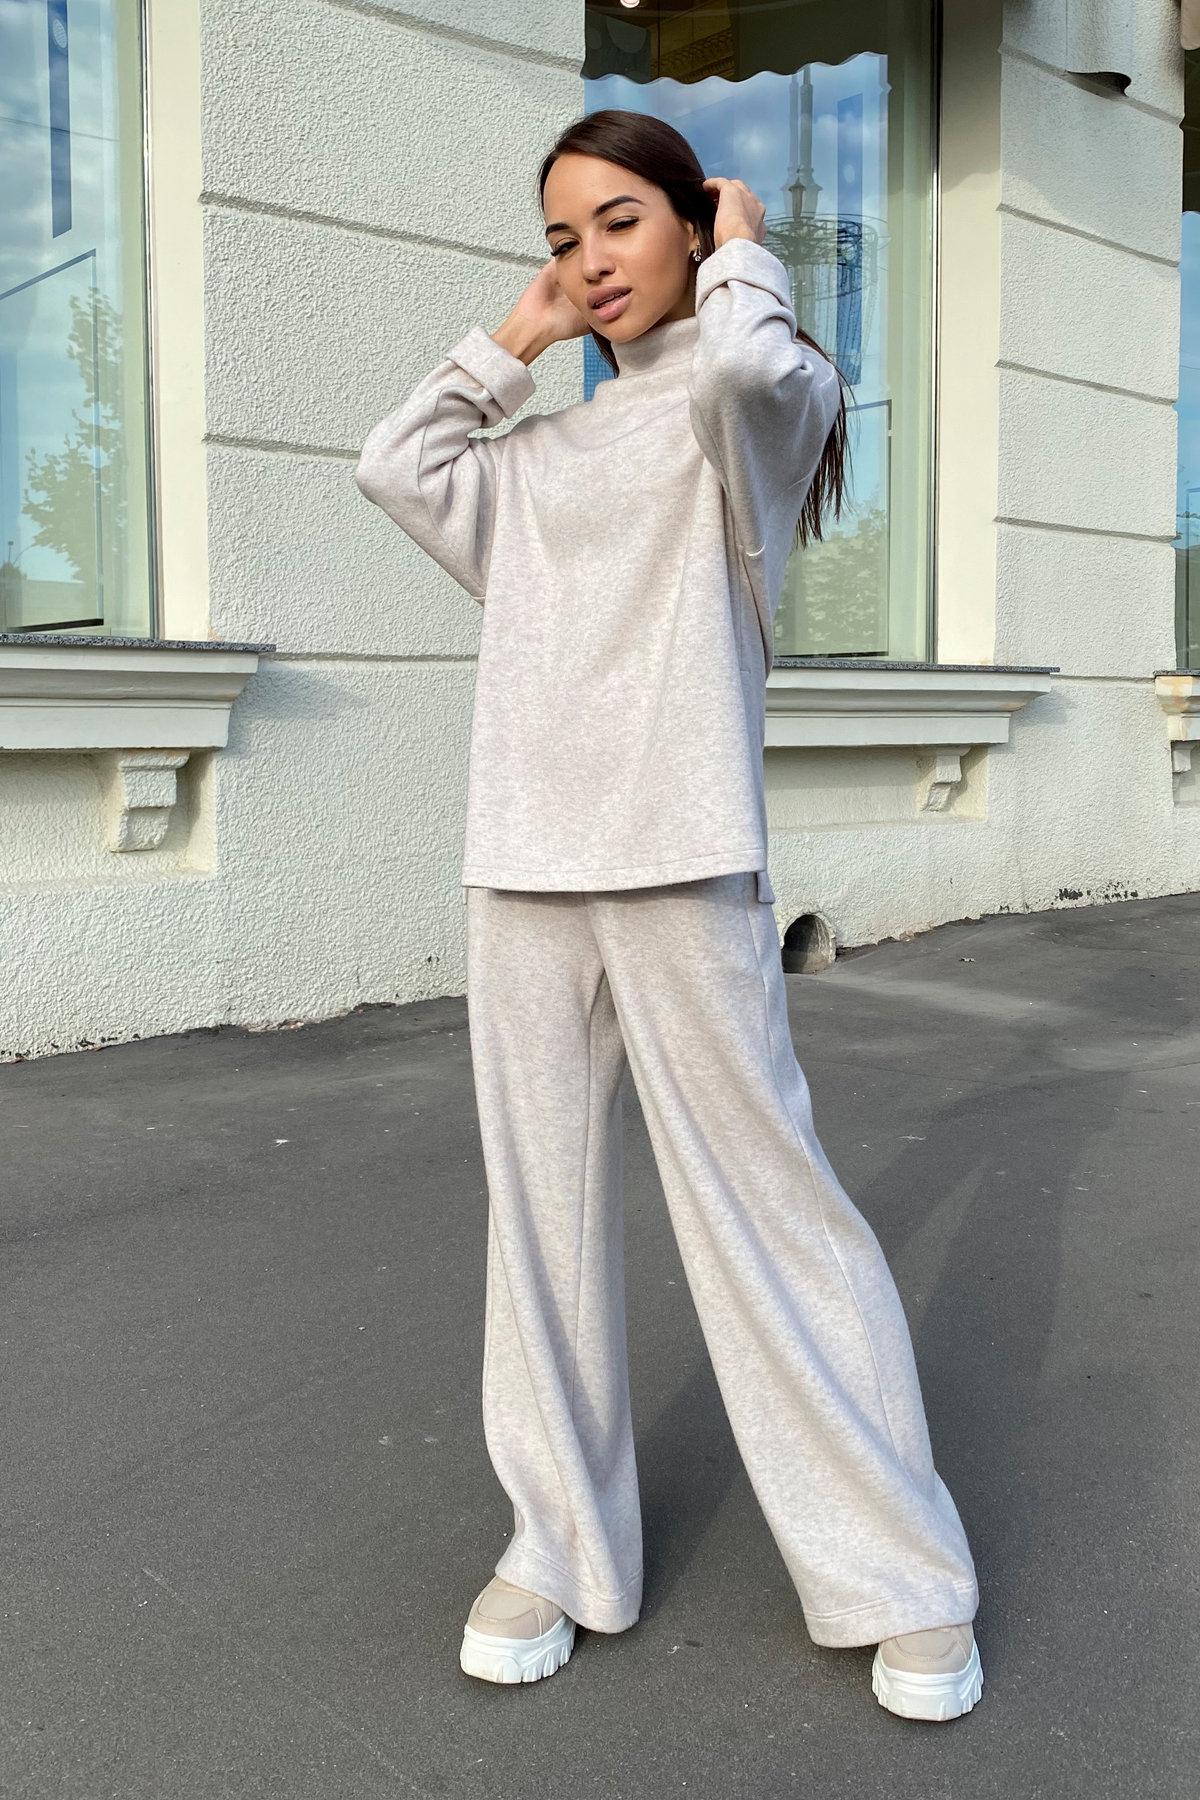 Лав Ю костюм из ангоры 9806 АРТ. 46093 Цвет: Бежевый - фото 2, интернет магазин tm-modus.ru